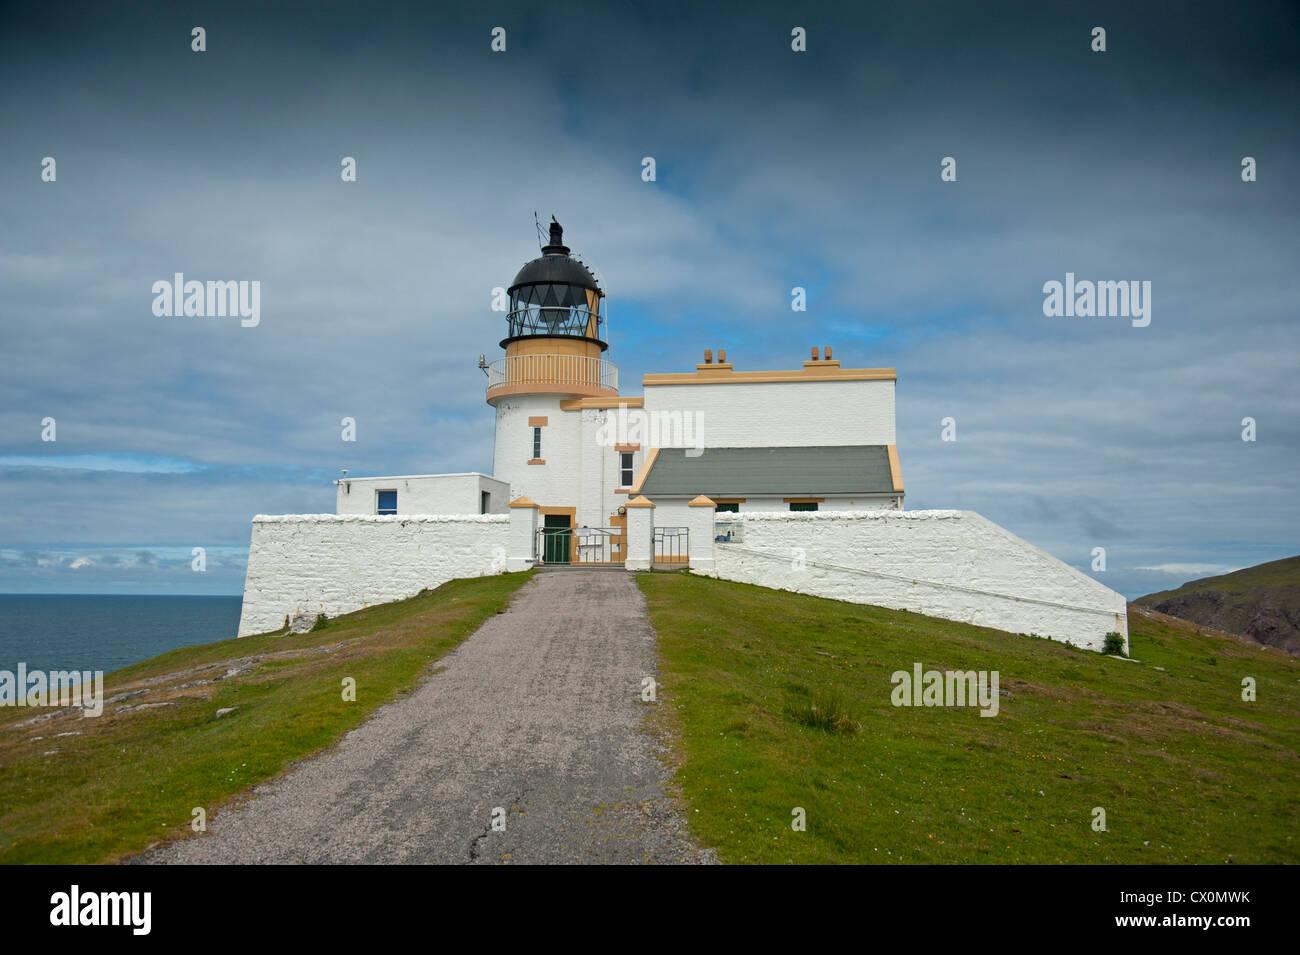 Stoer Head Lighthouse, Clashmore. Raffin. Sutherland, Scotland. SCO 8391 - Stock Image